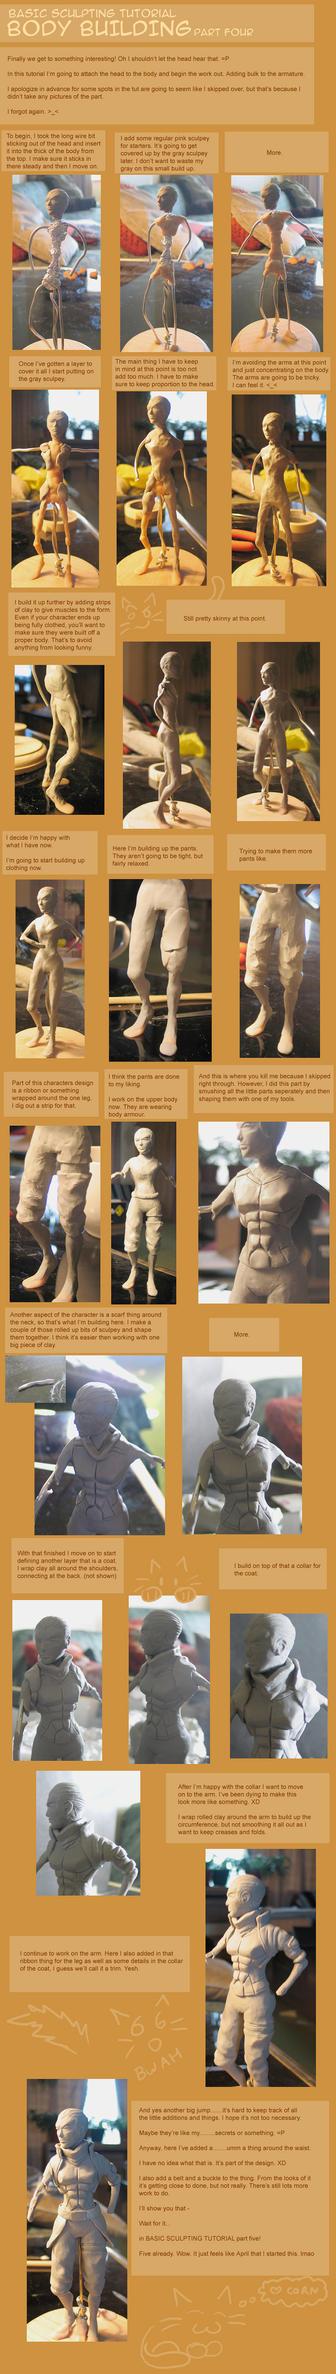 Tutorial 4 - Body Building by RennardX